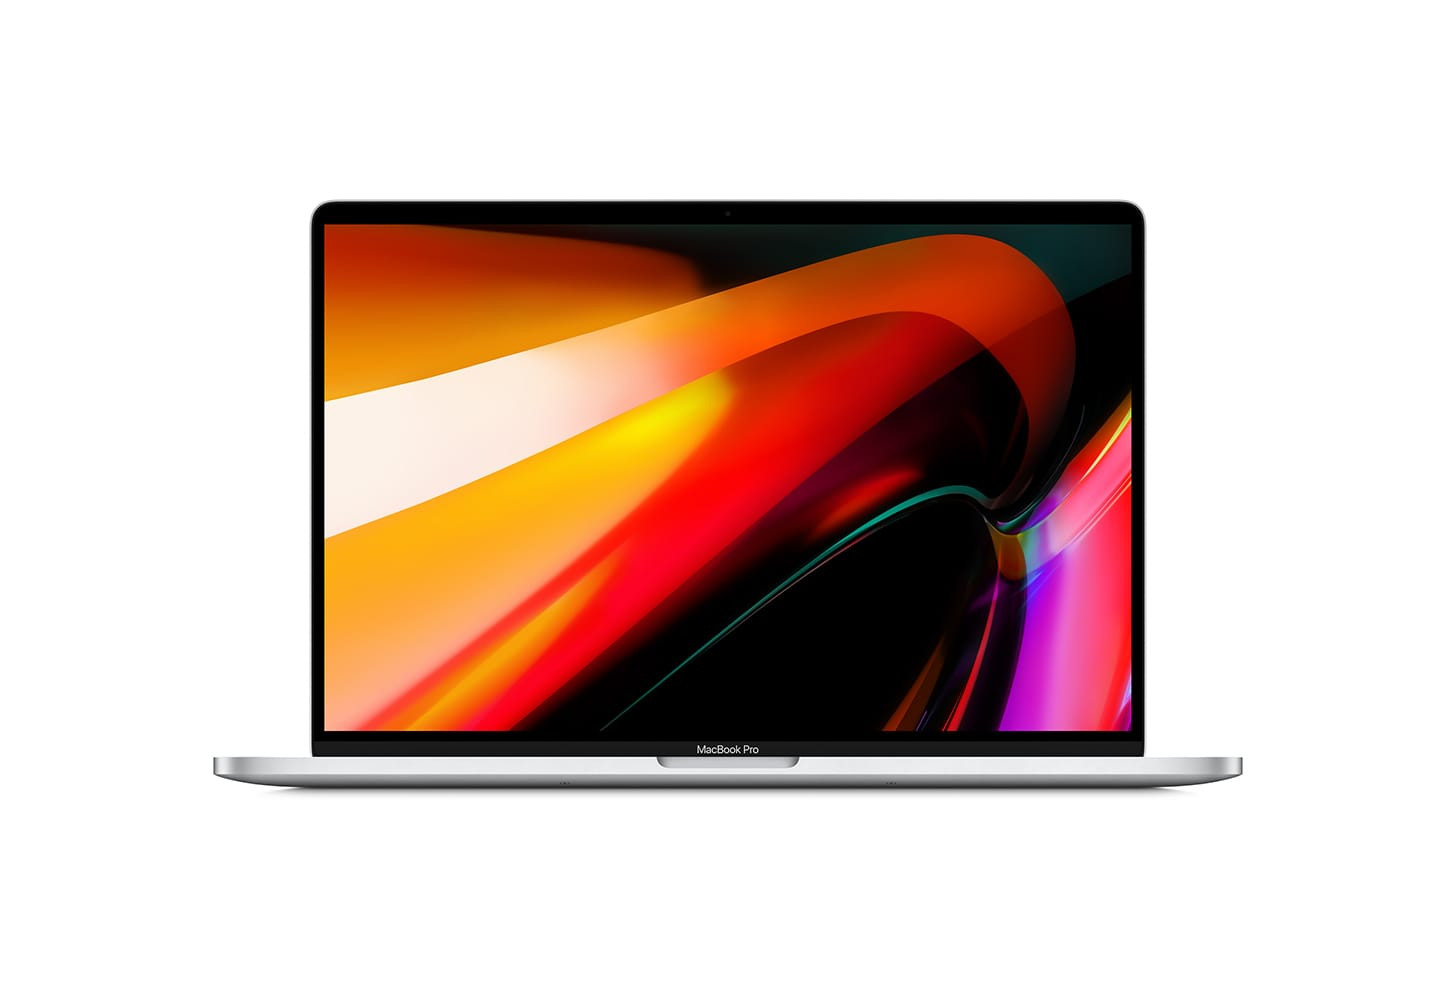 macbookpro-16-silver-1.jpg